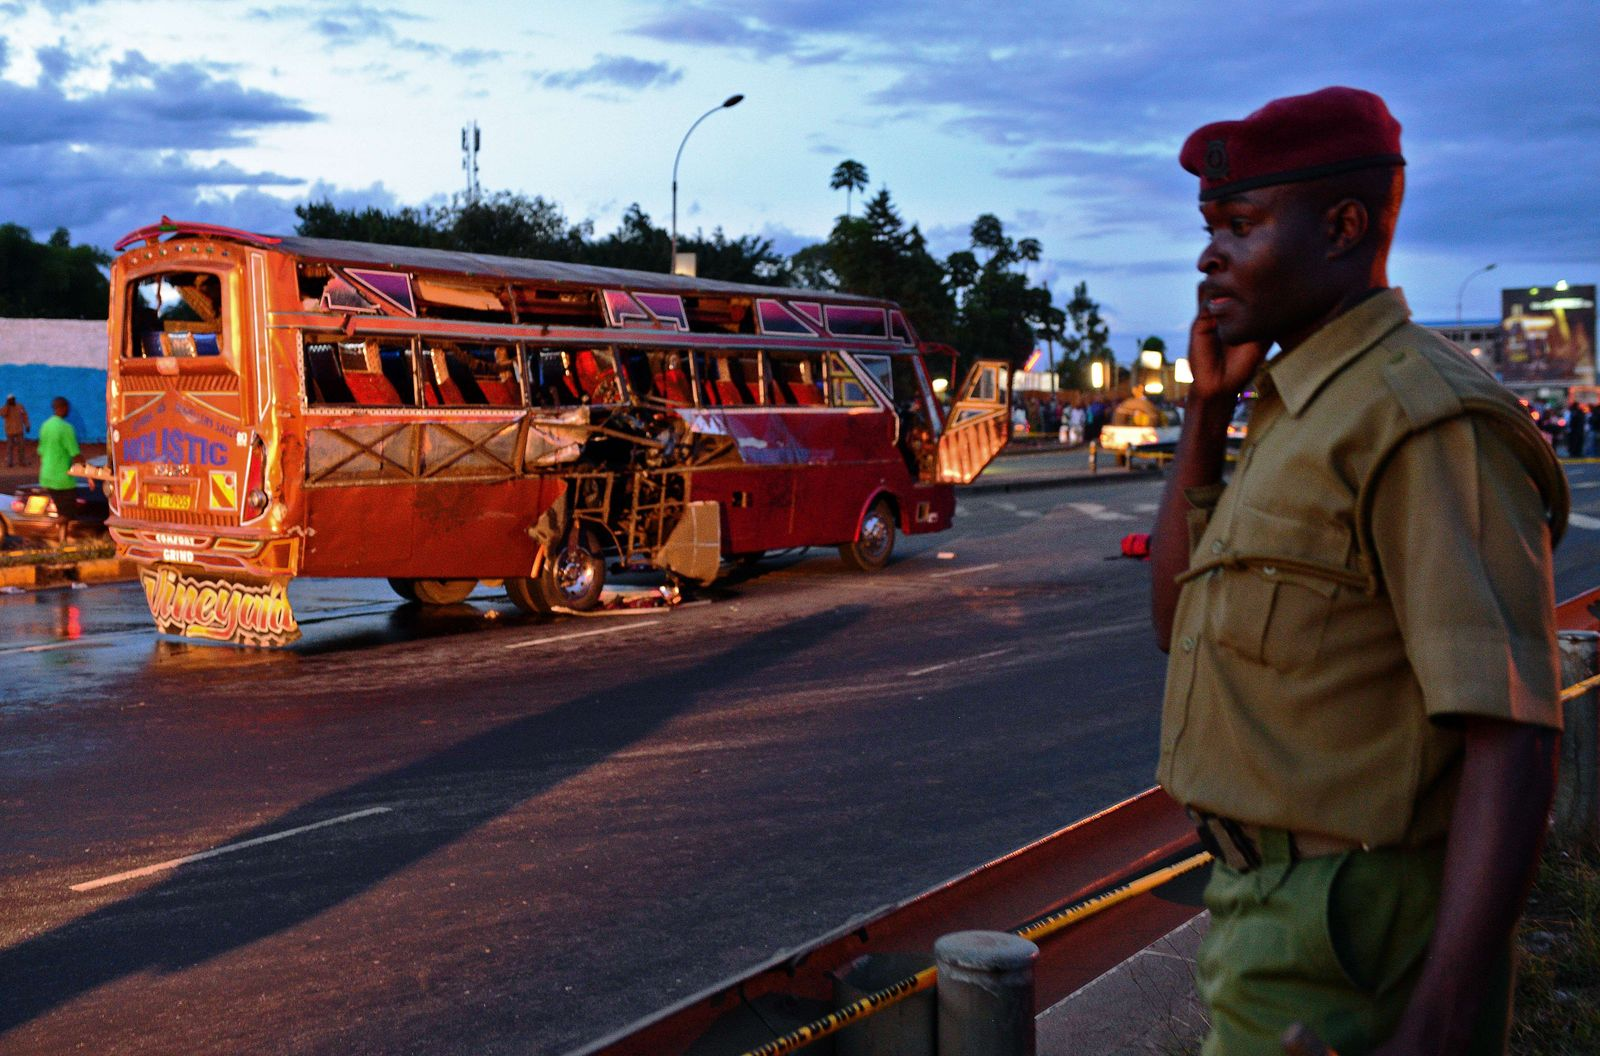 Kemia: Bomebanschlag auf Bus in Nairobi